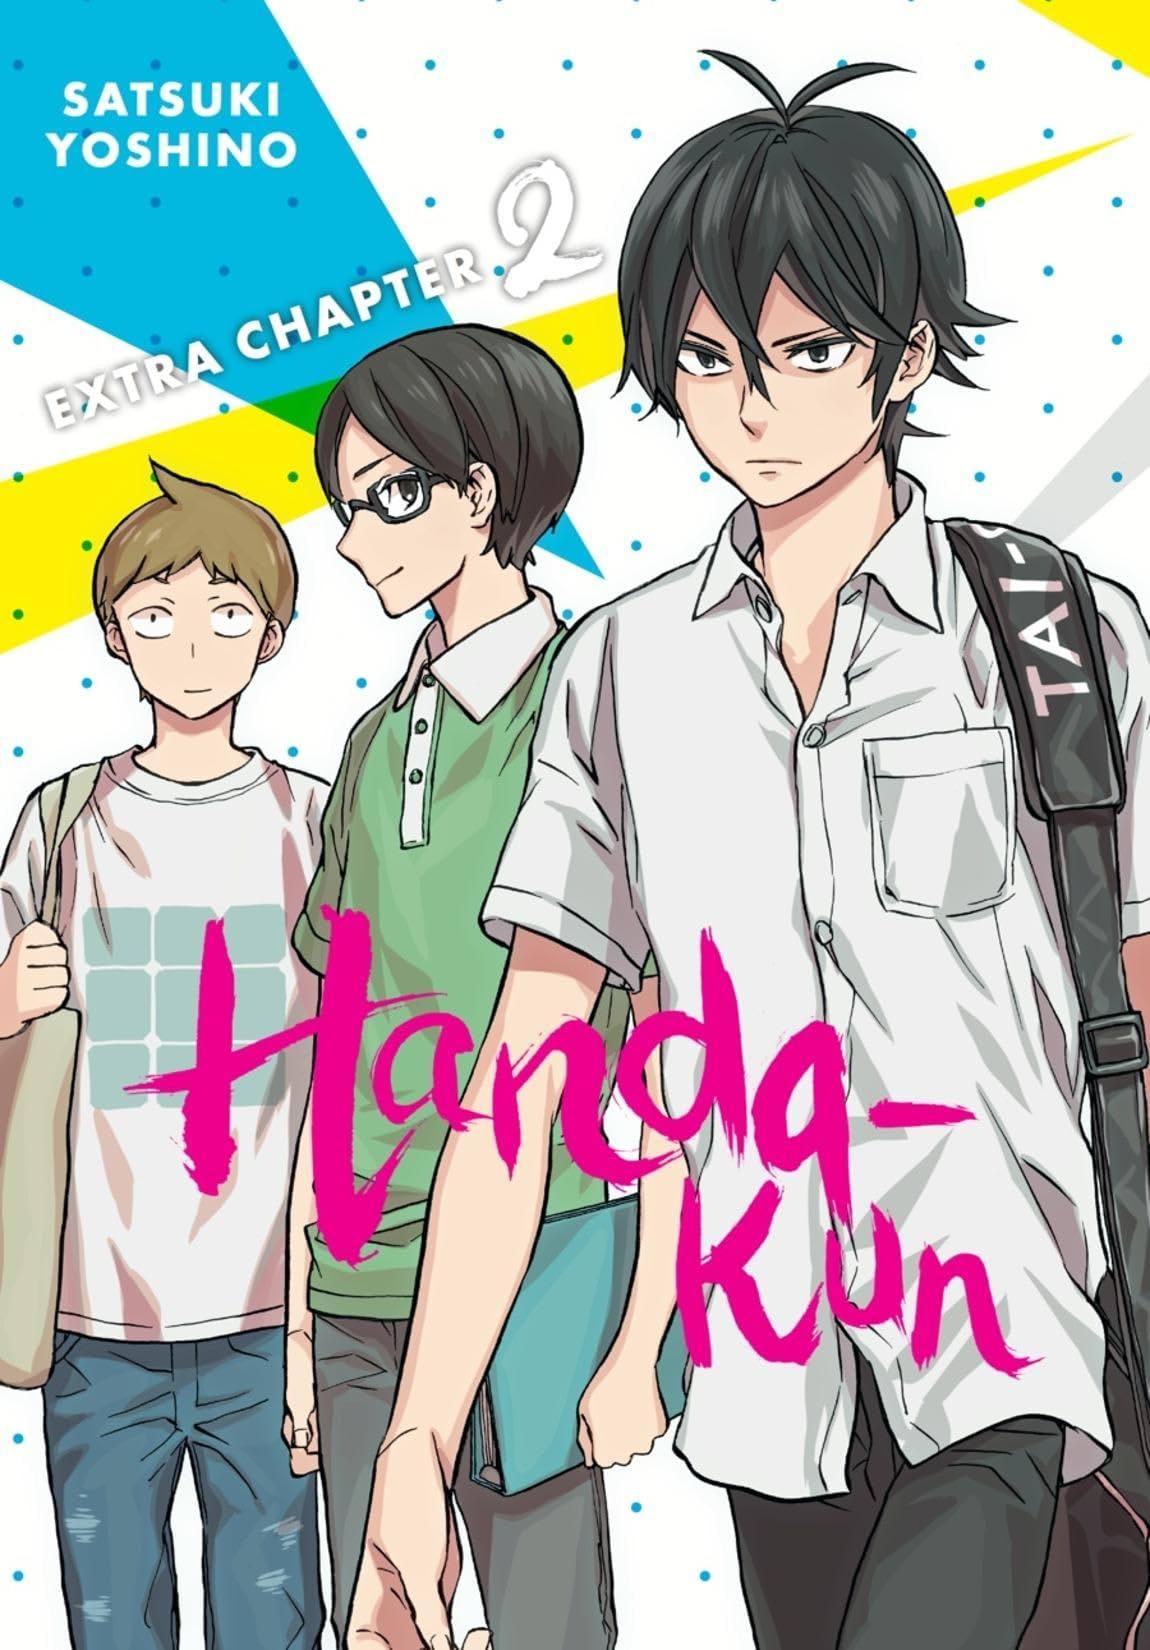 Handa-kun #2: Extra